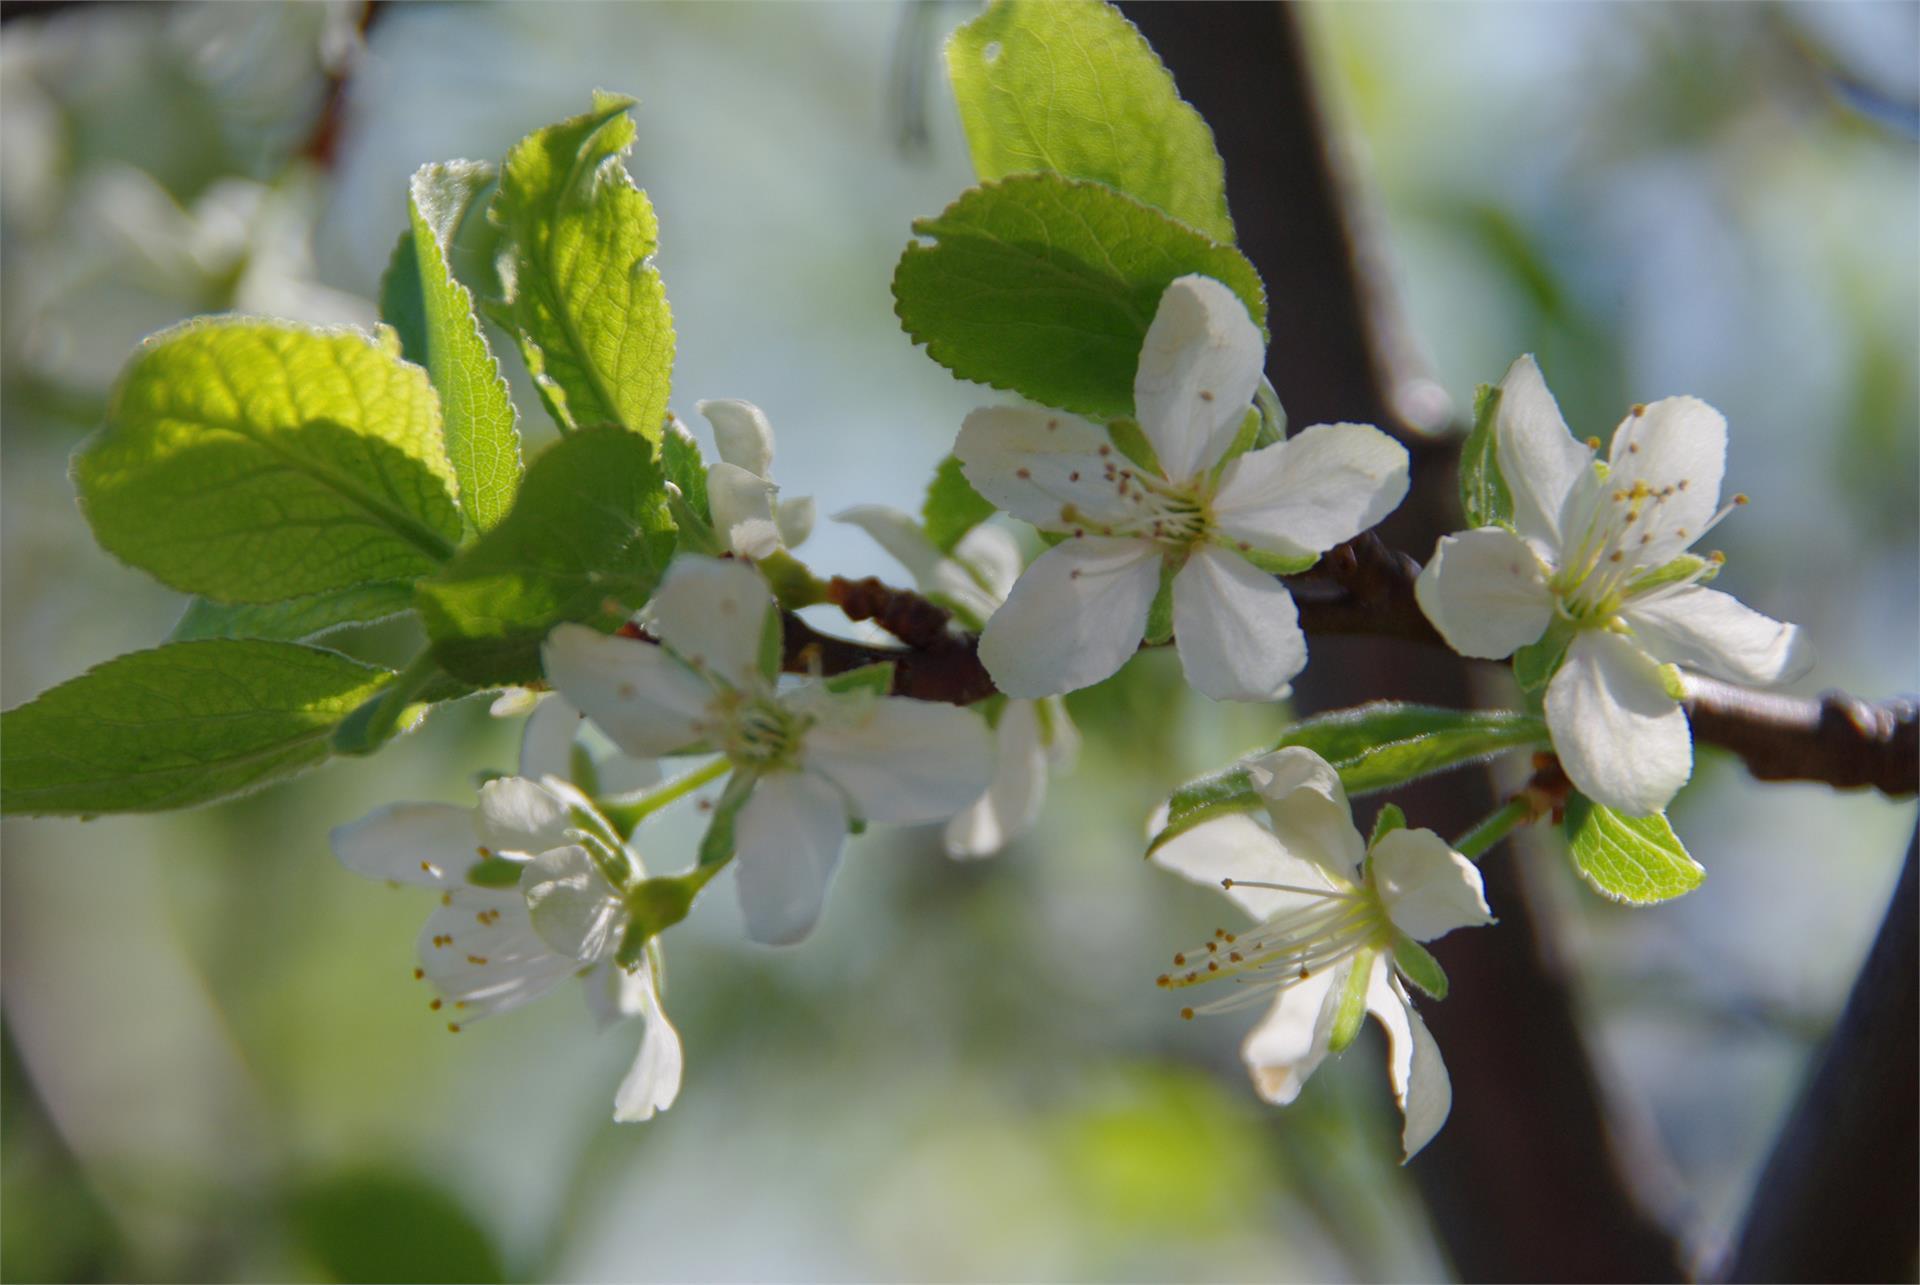 Escursione guidata tra prugni fioriti